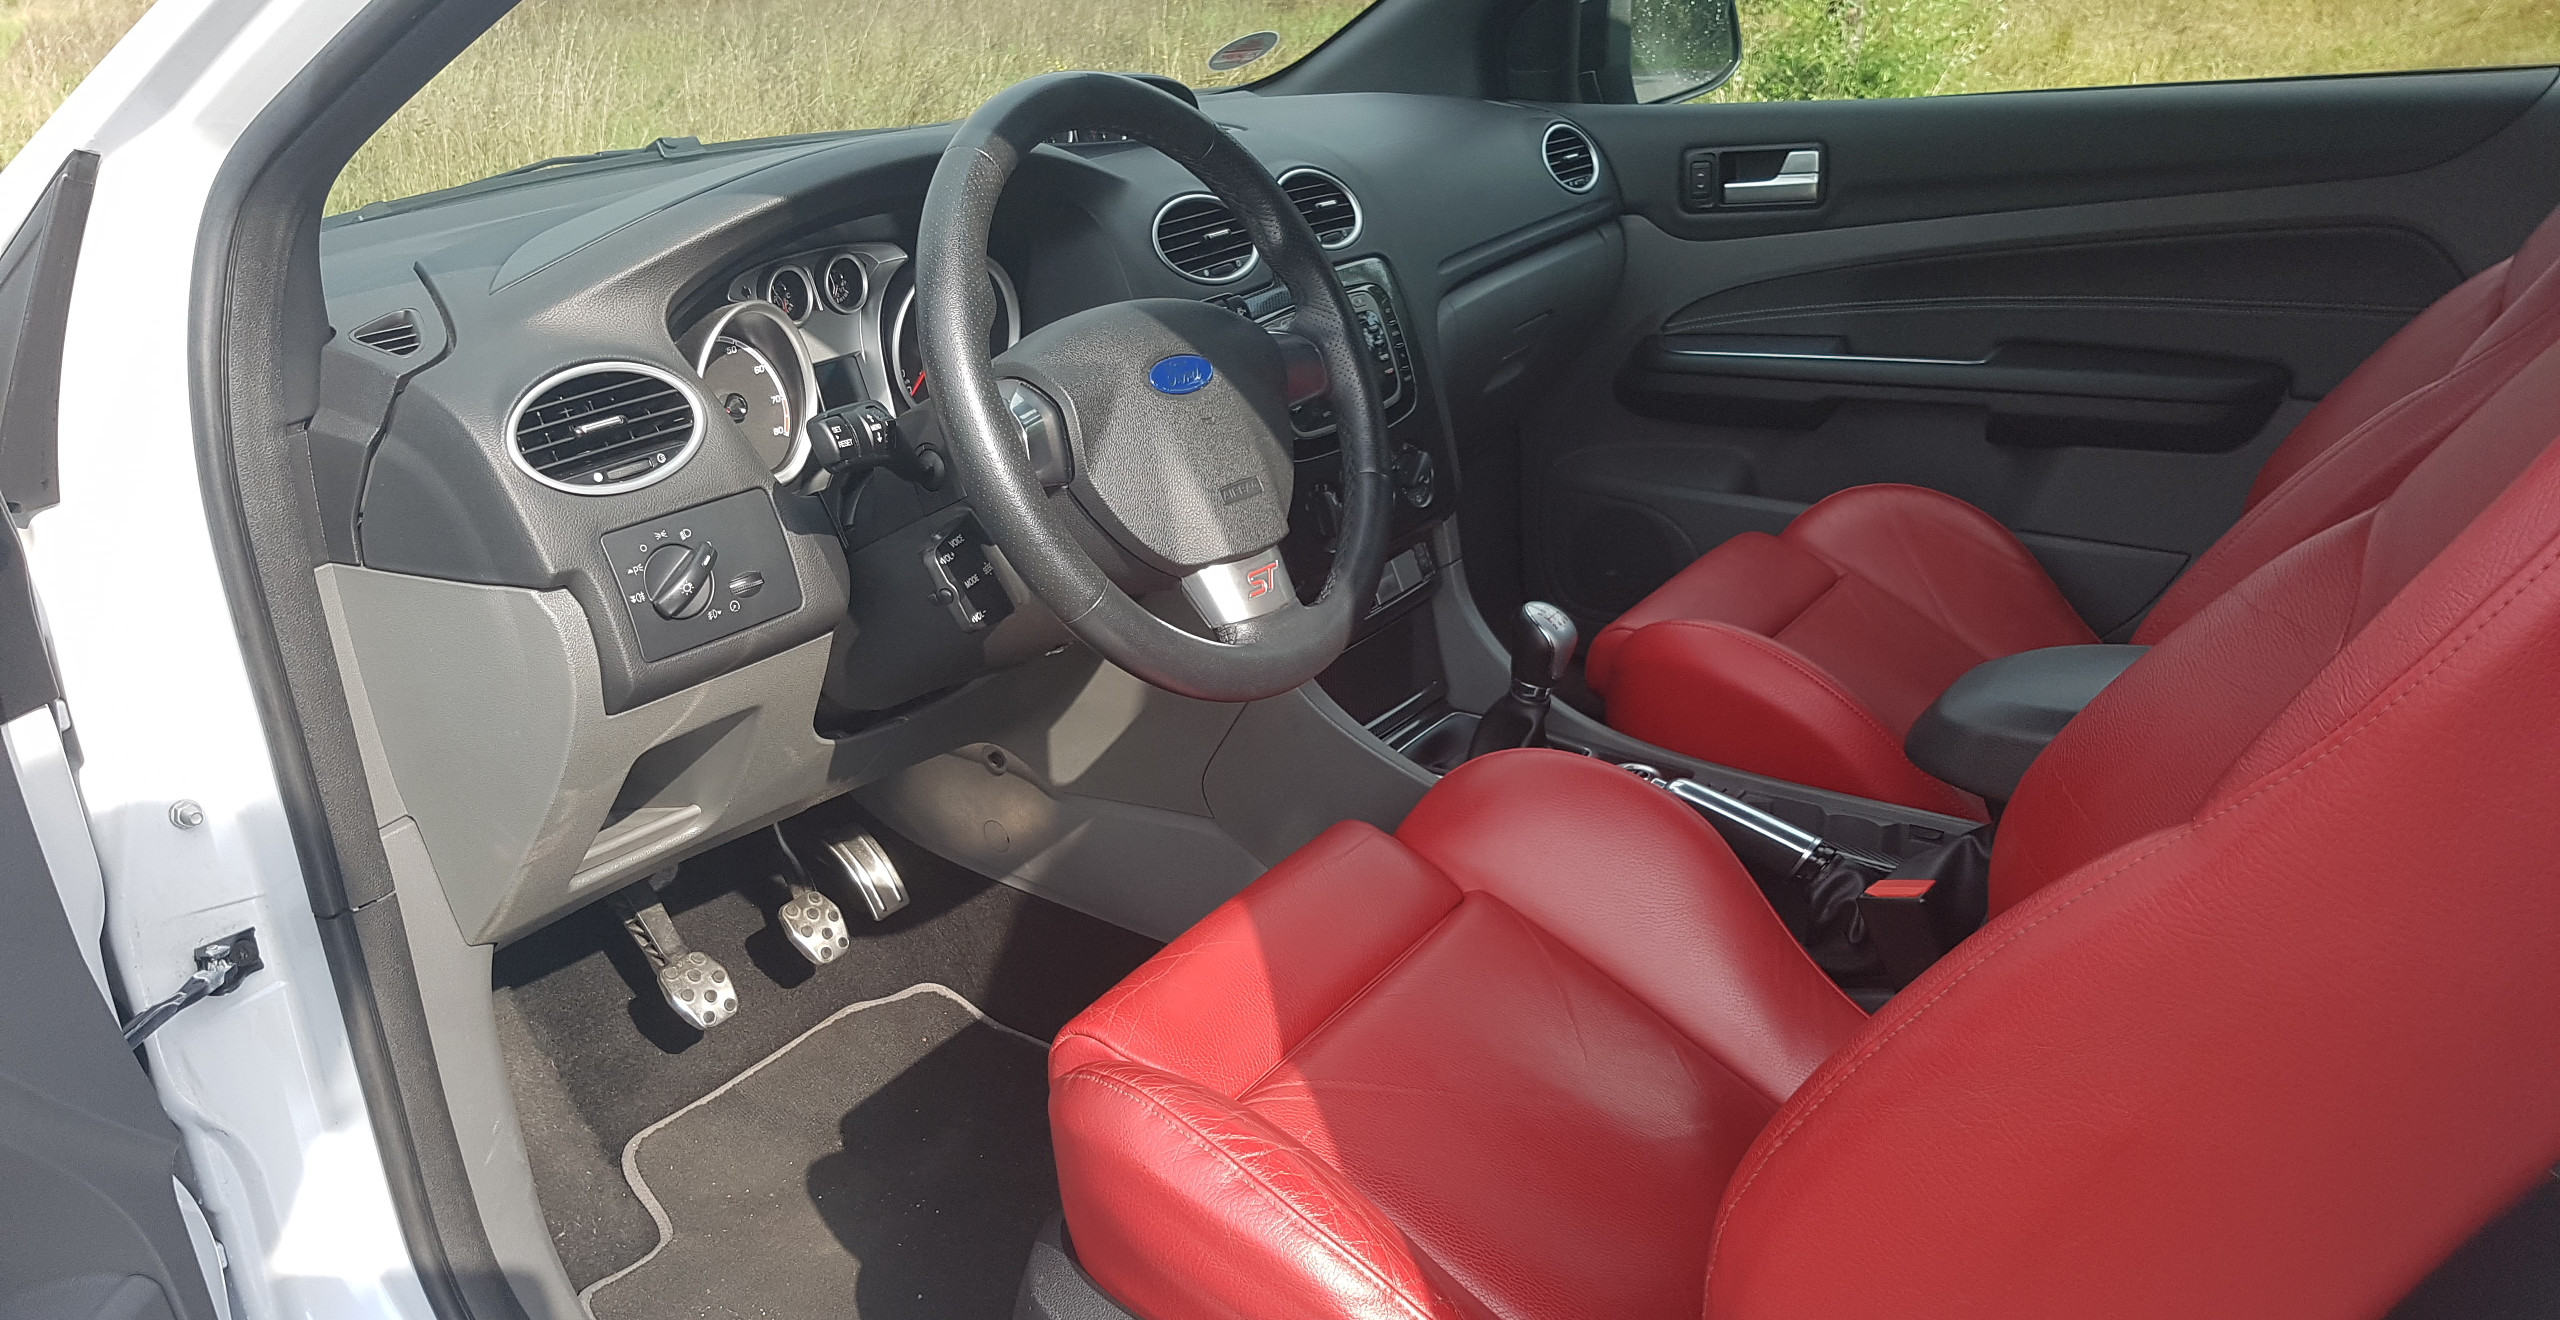 Import Auto Allemagne - Auto Convoi Allemagne -  Ford Focus ST 2.5T 226ch